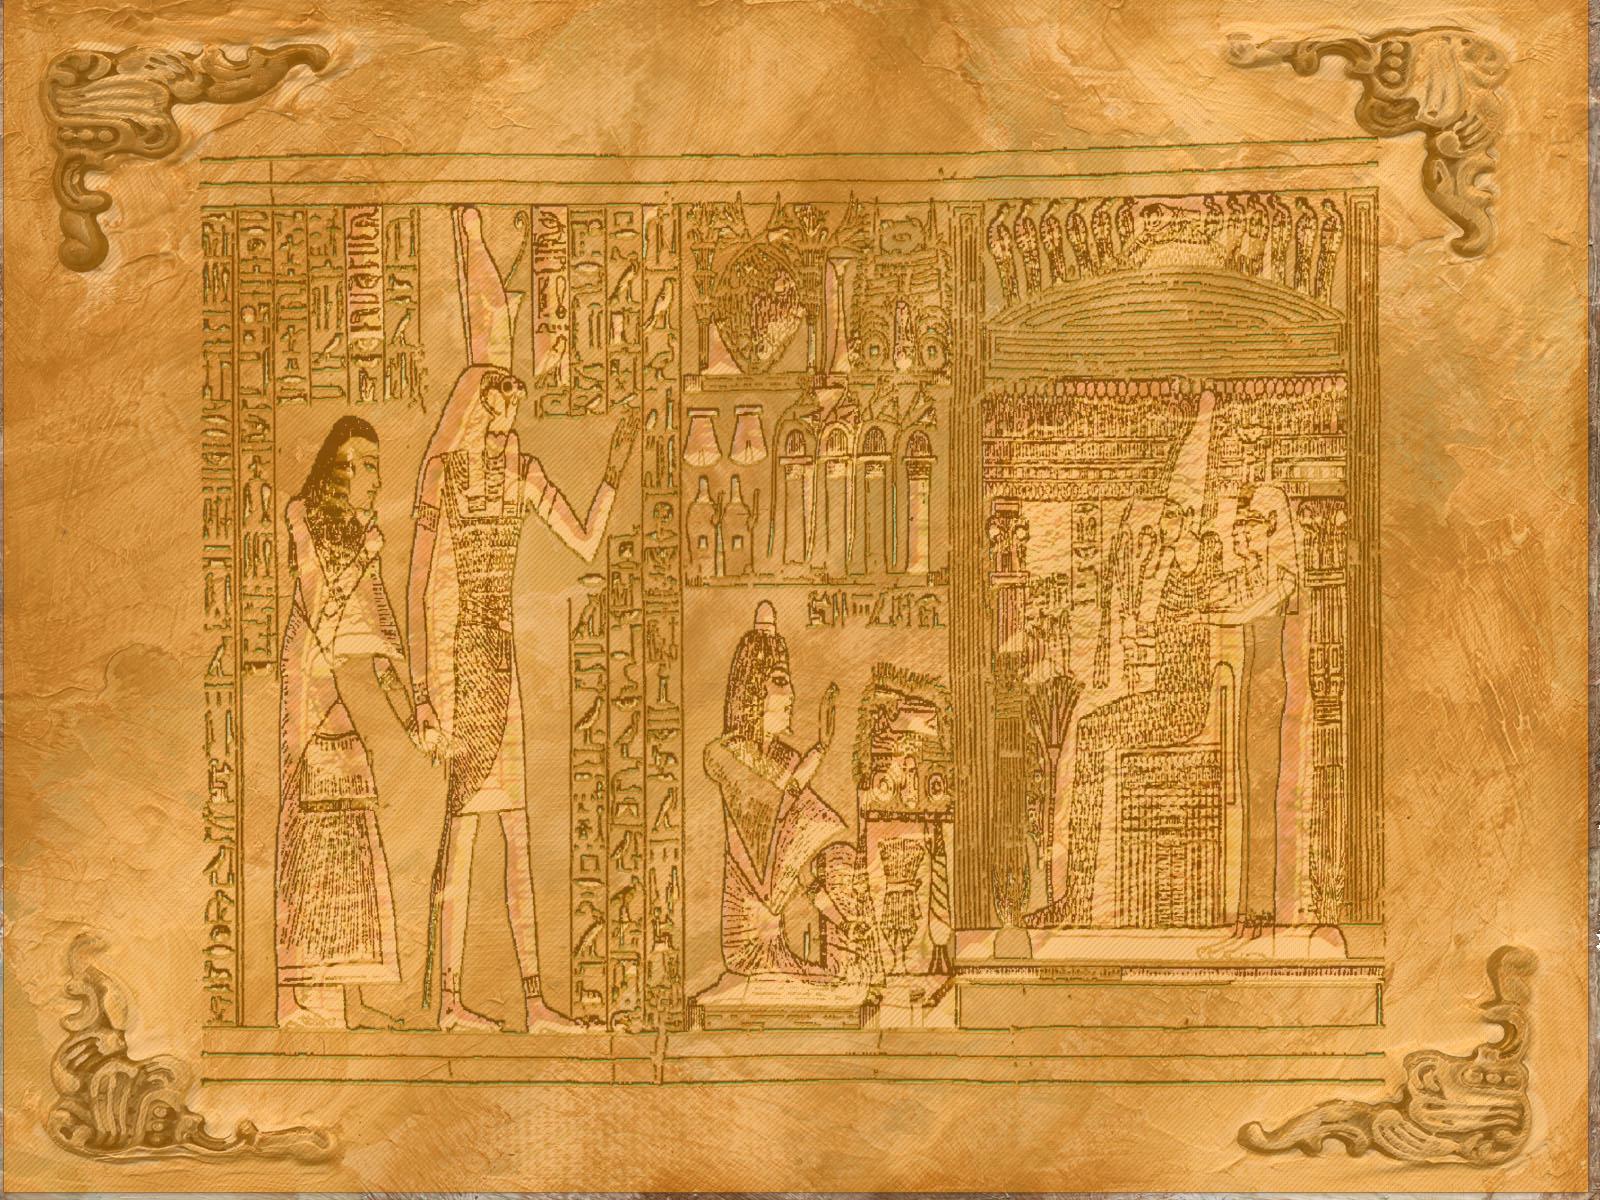 PC Wallpaper Ancient Egypt - WallpaperSafari